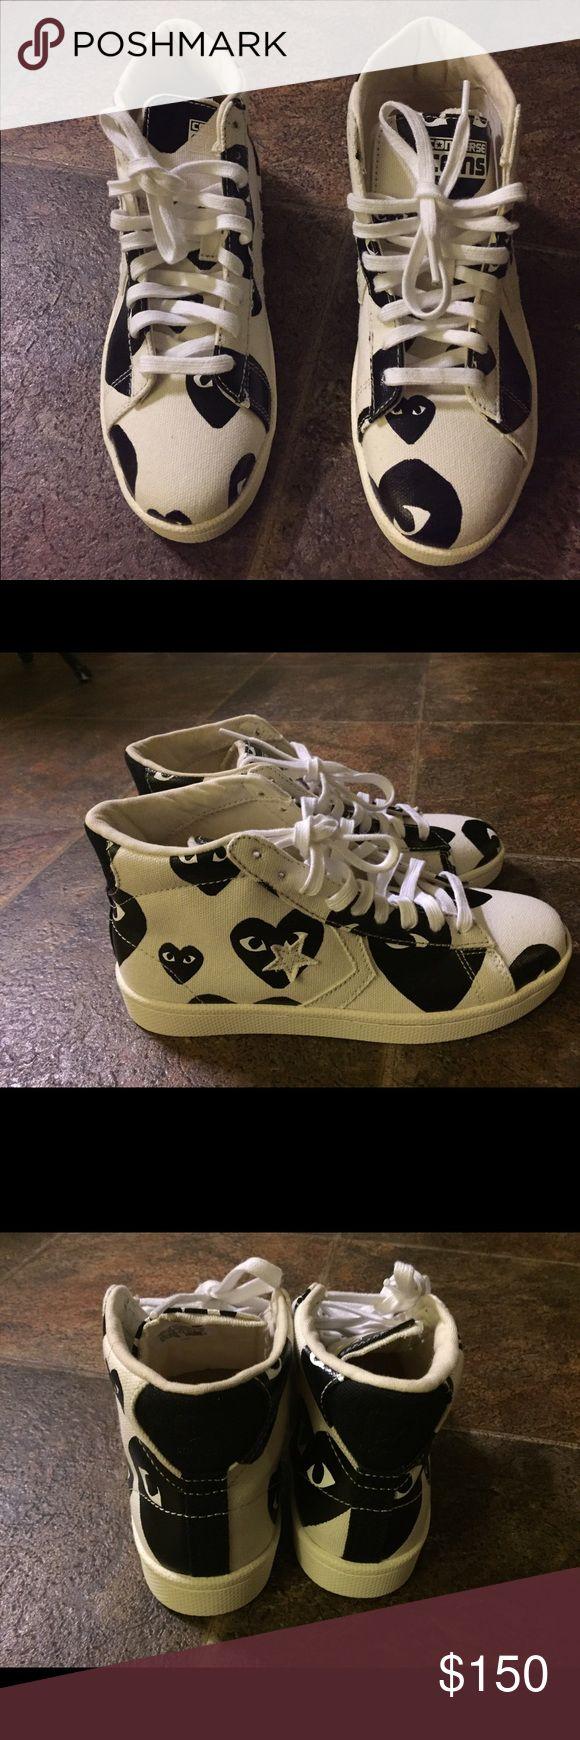 COMME DES GARÇON x CONVERSE Black & white comme des garcon x converse colab sneakers, practically new literally wore them for a few minutes. *COMES WITH BOX* Comme des Garcons Shoes Sneakers